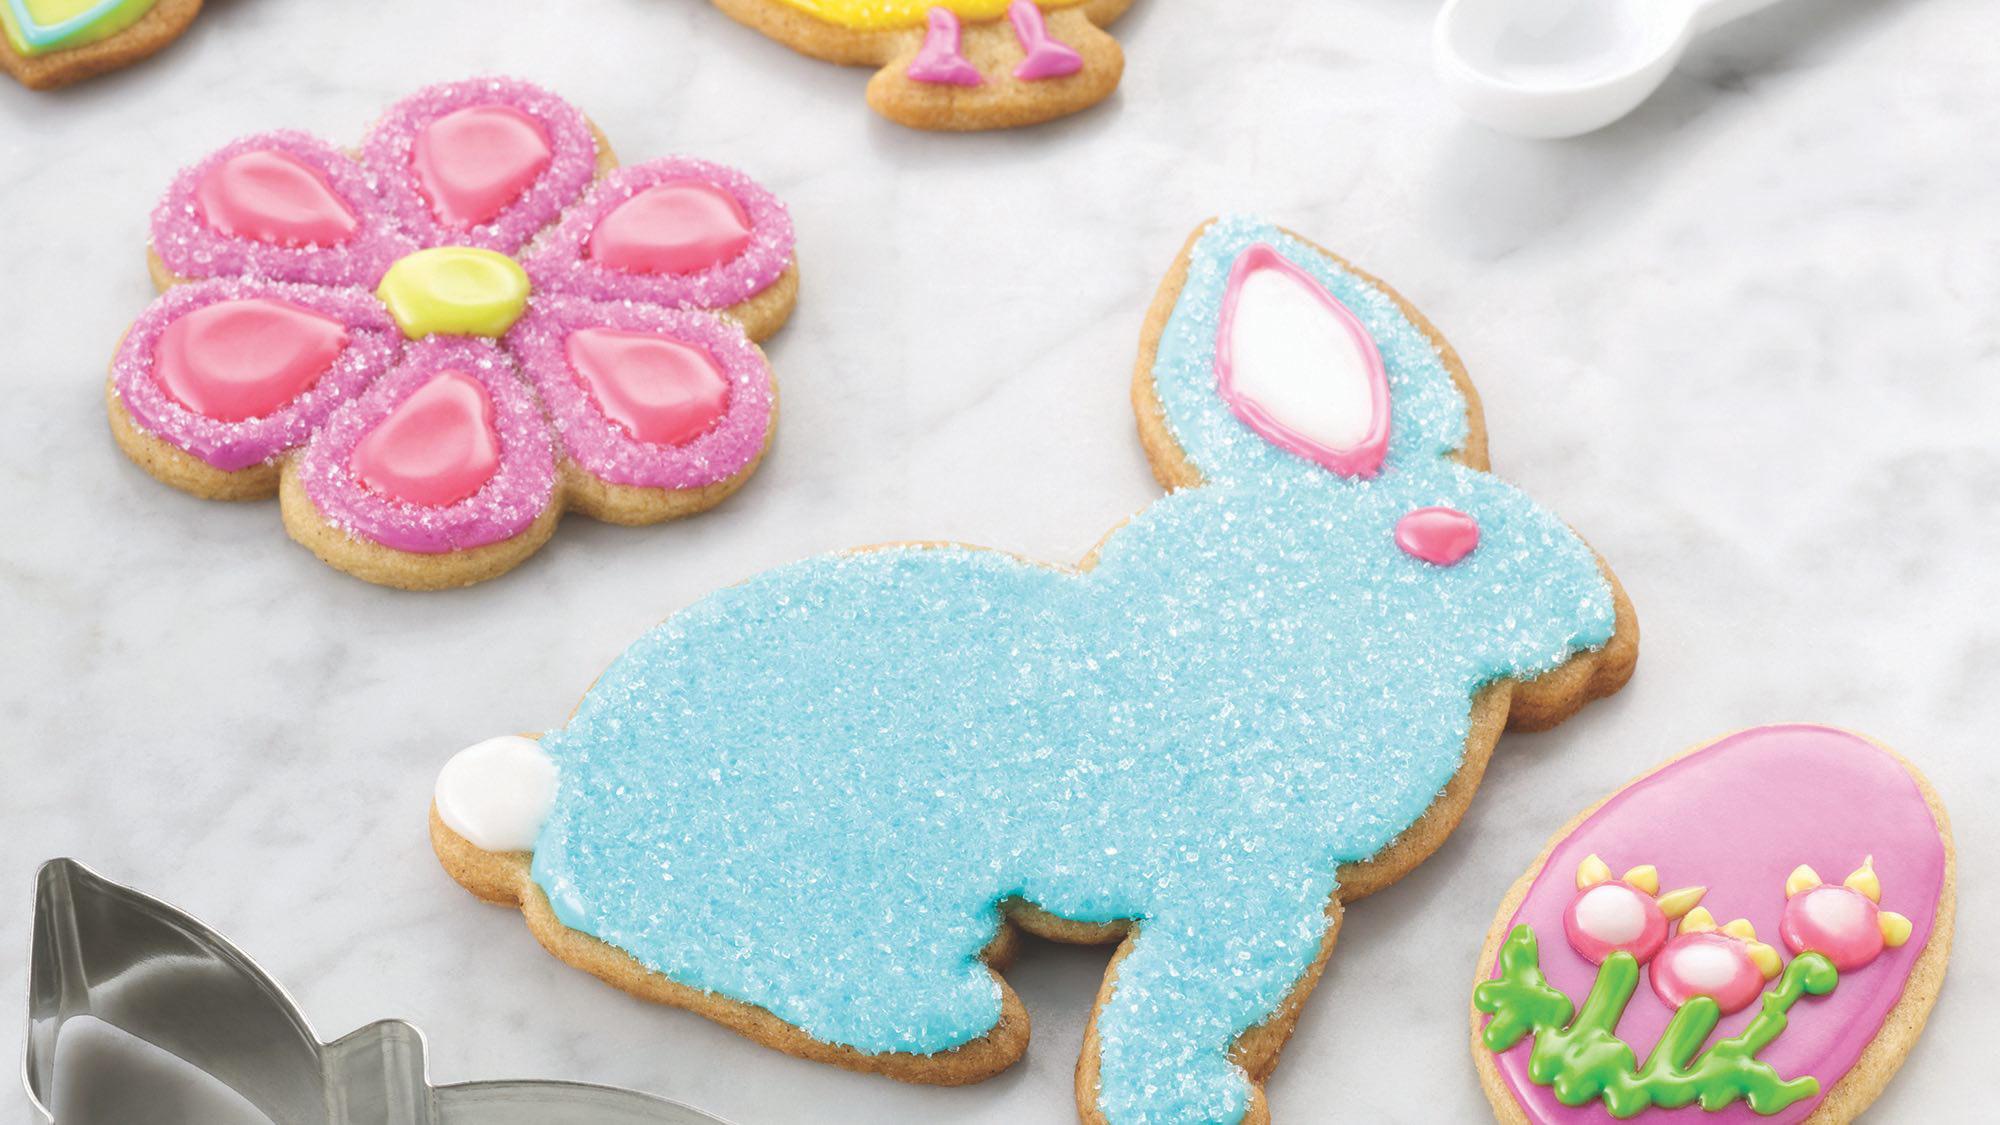 McCormick Spiced Springtime Sugar Cookies